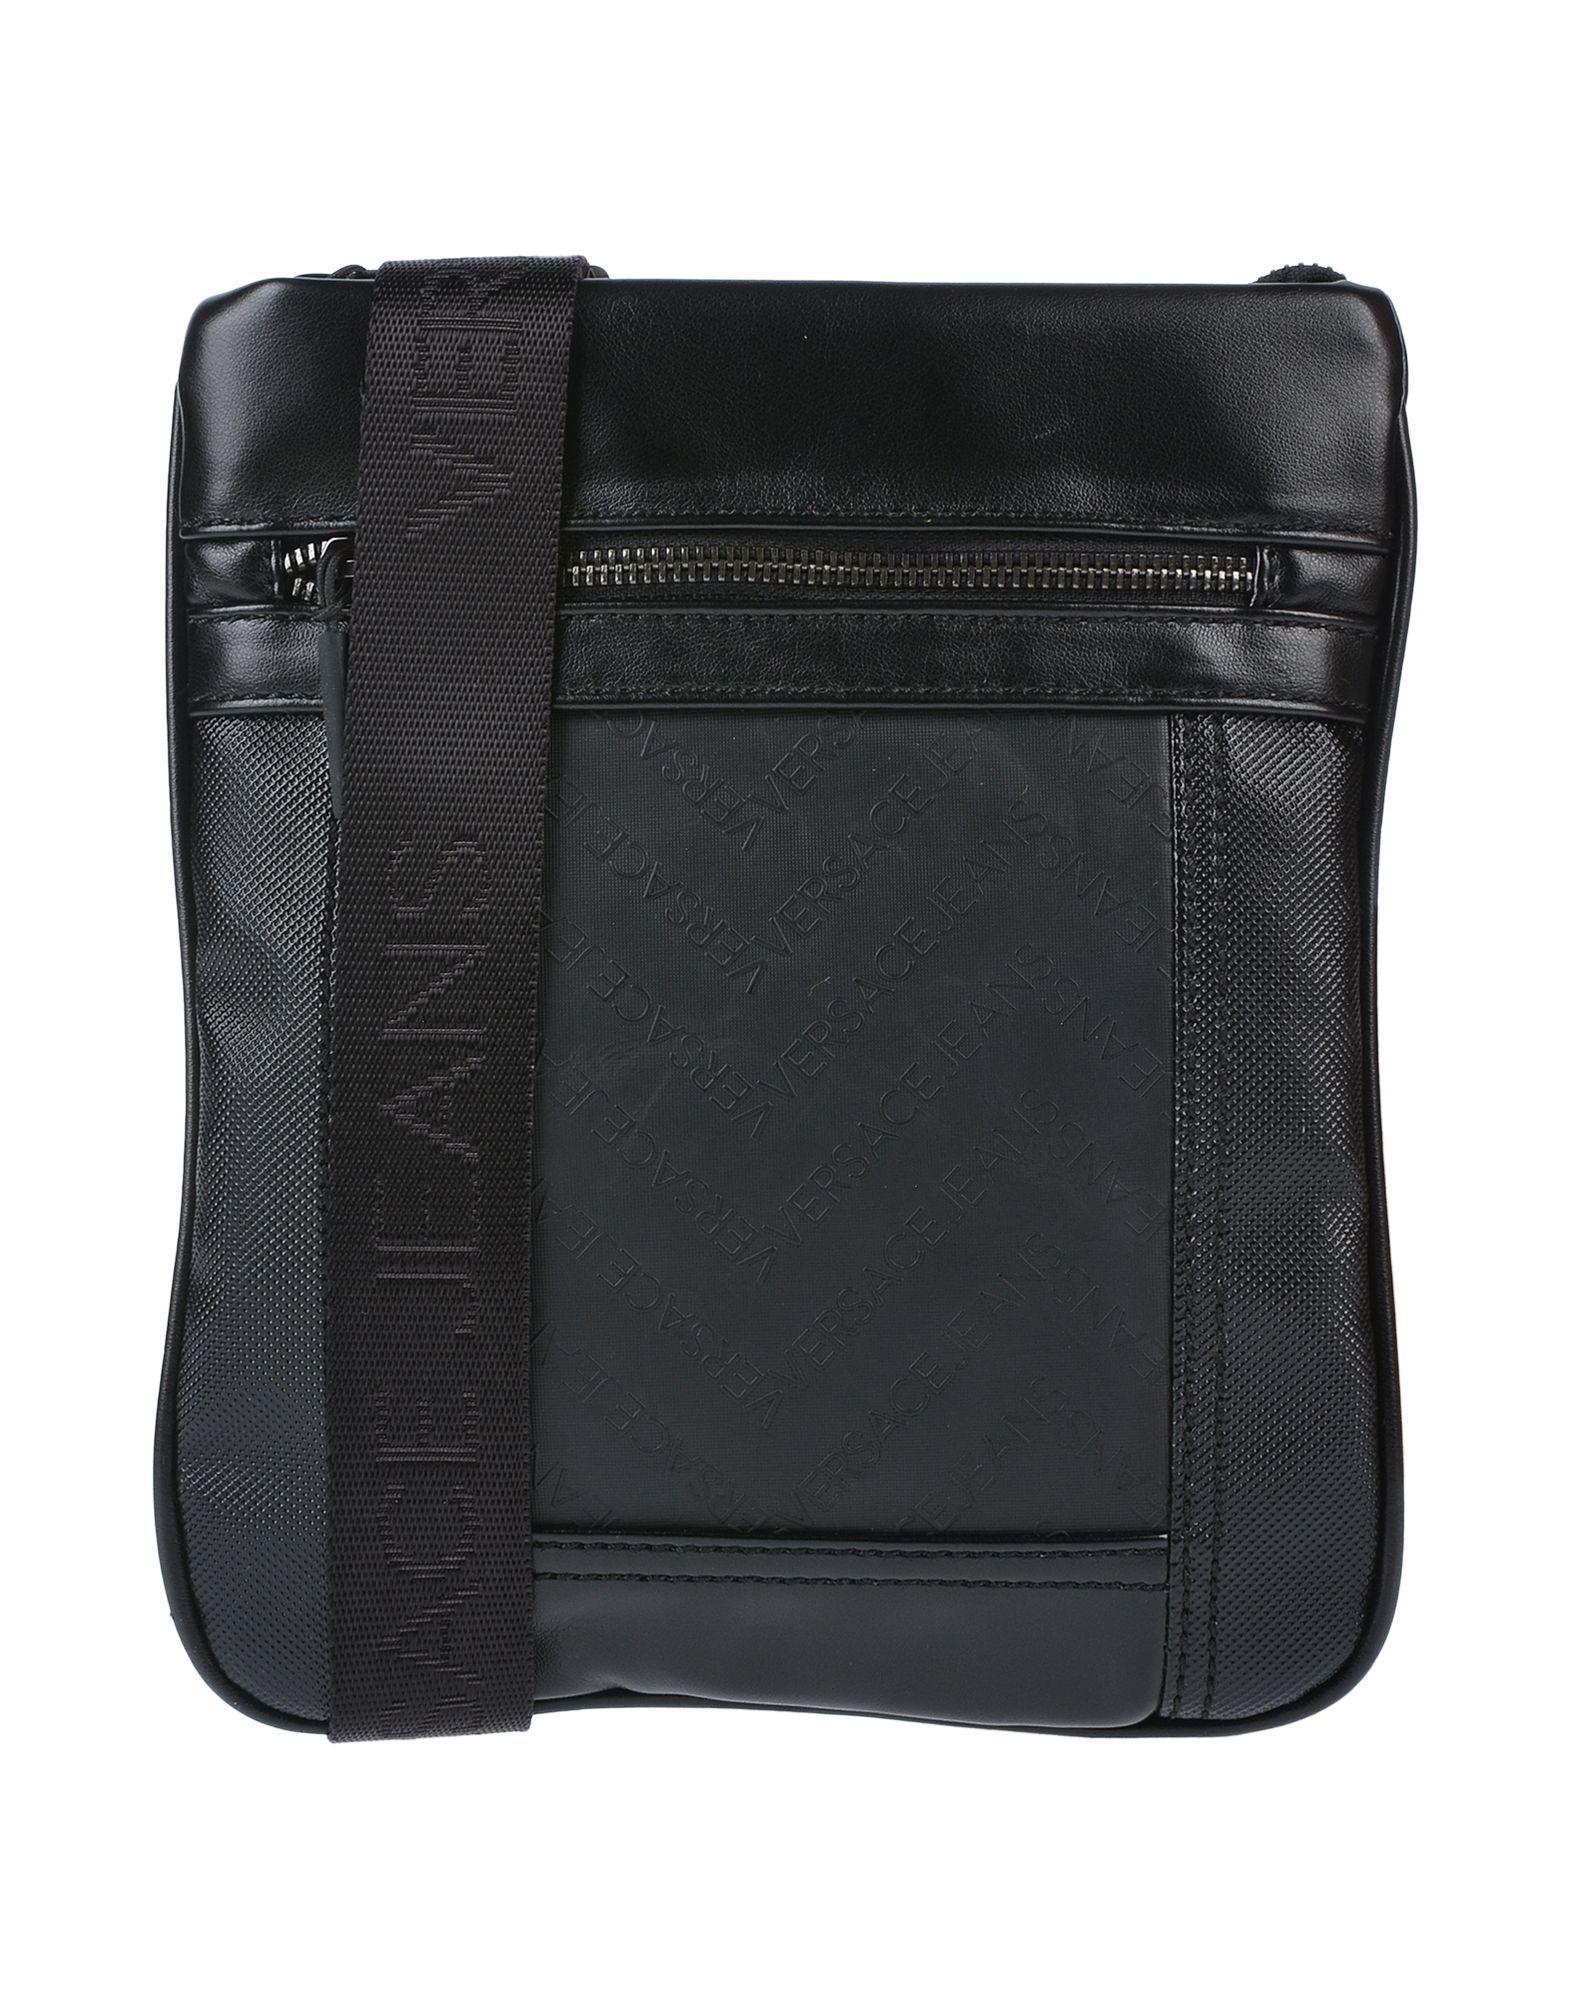 Versace Jeans Cross-body Bags in Black for Men - Lyst acf11b0c1359c